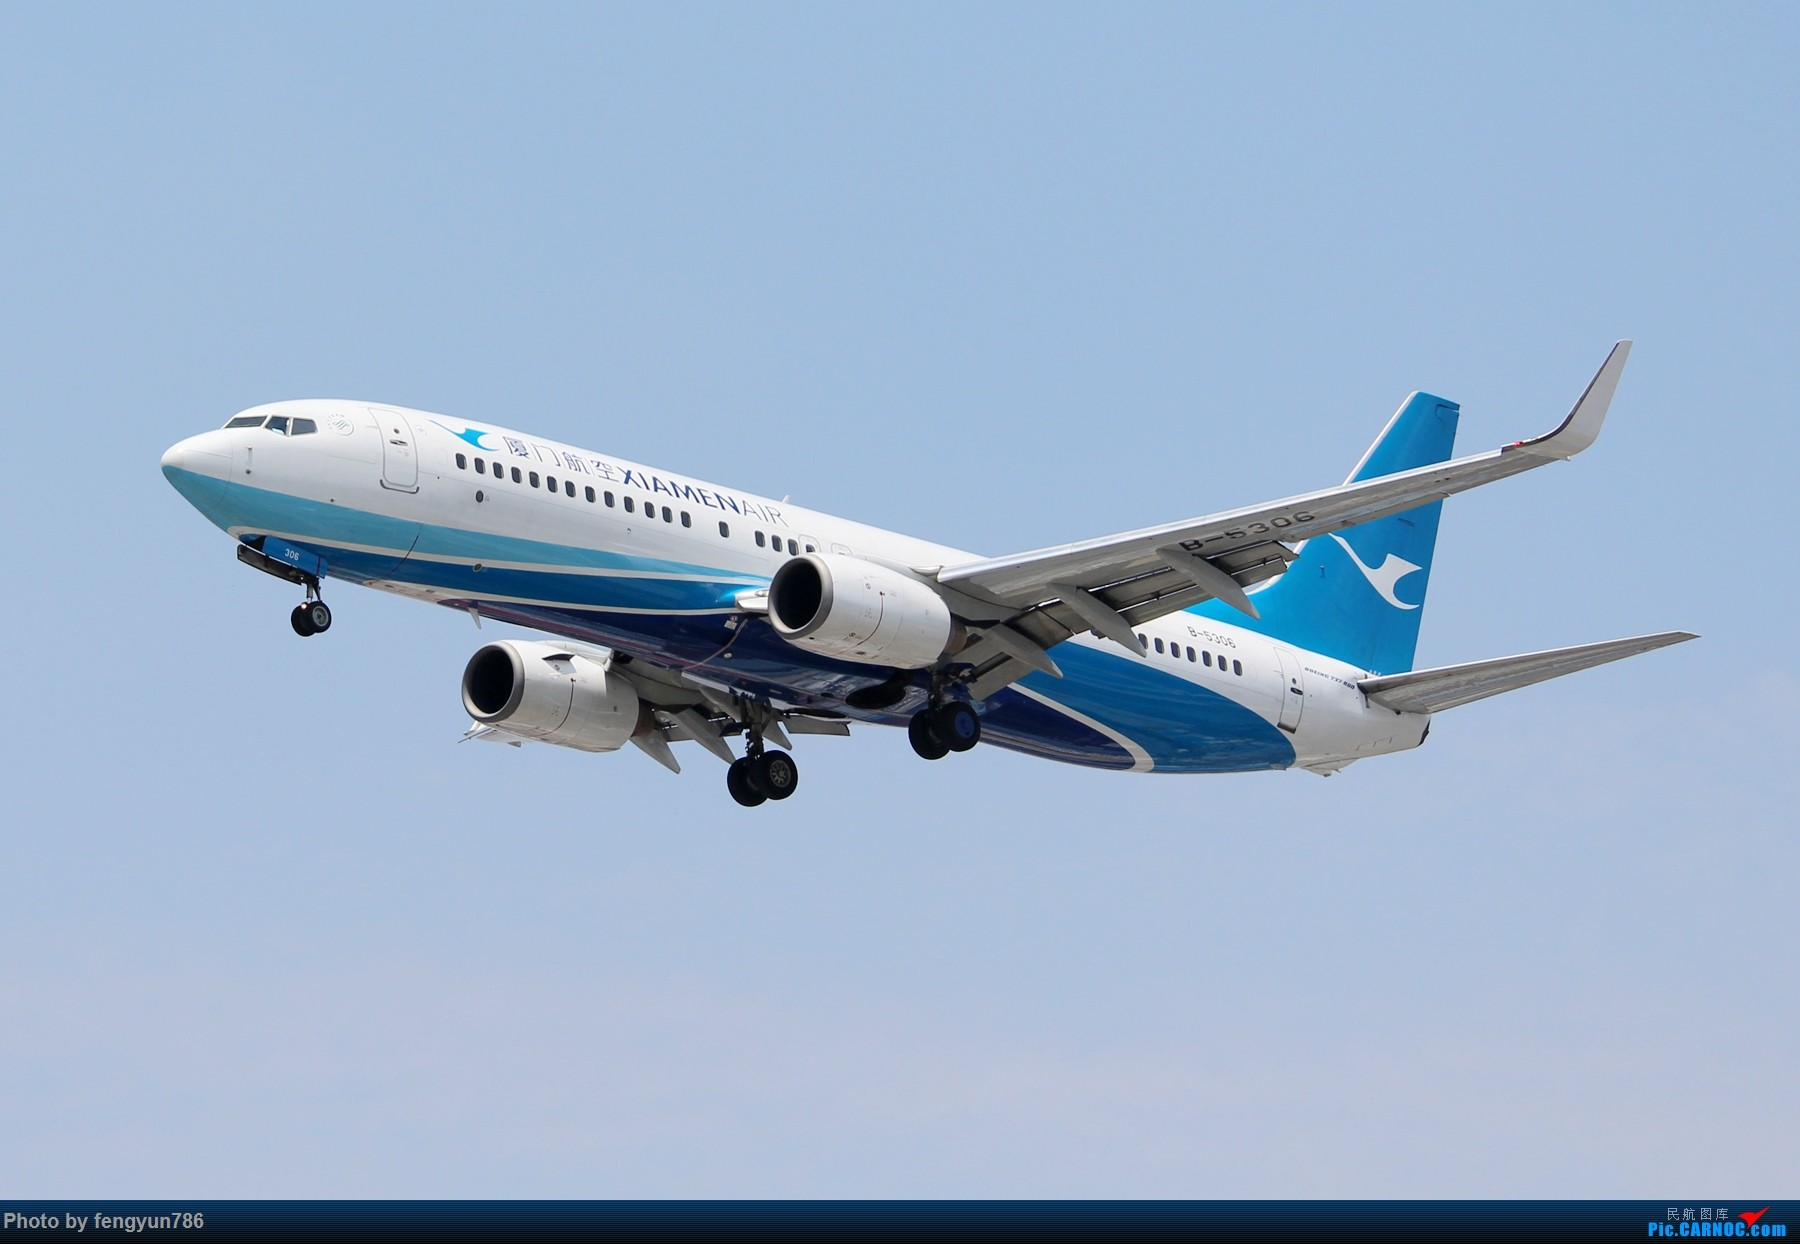 Re:[原创]7.19的SHA,天晴温高,发几个跟前一天不一样的。 BOEING 737-800 B-5306 中国上海虹桥国际机场